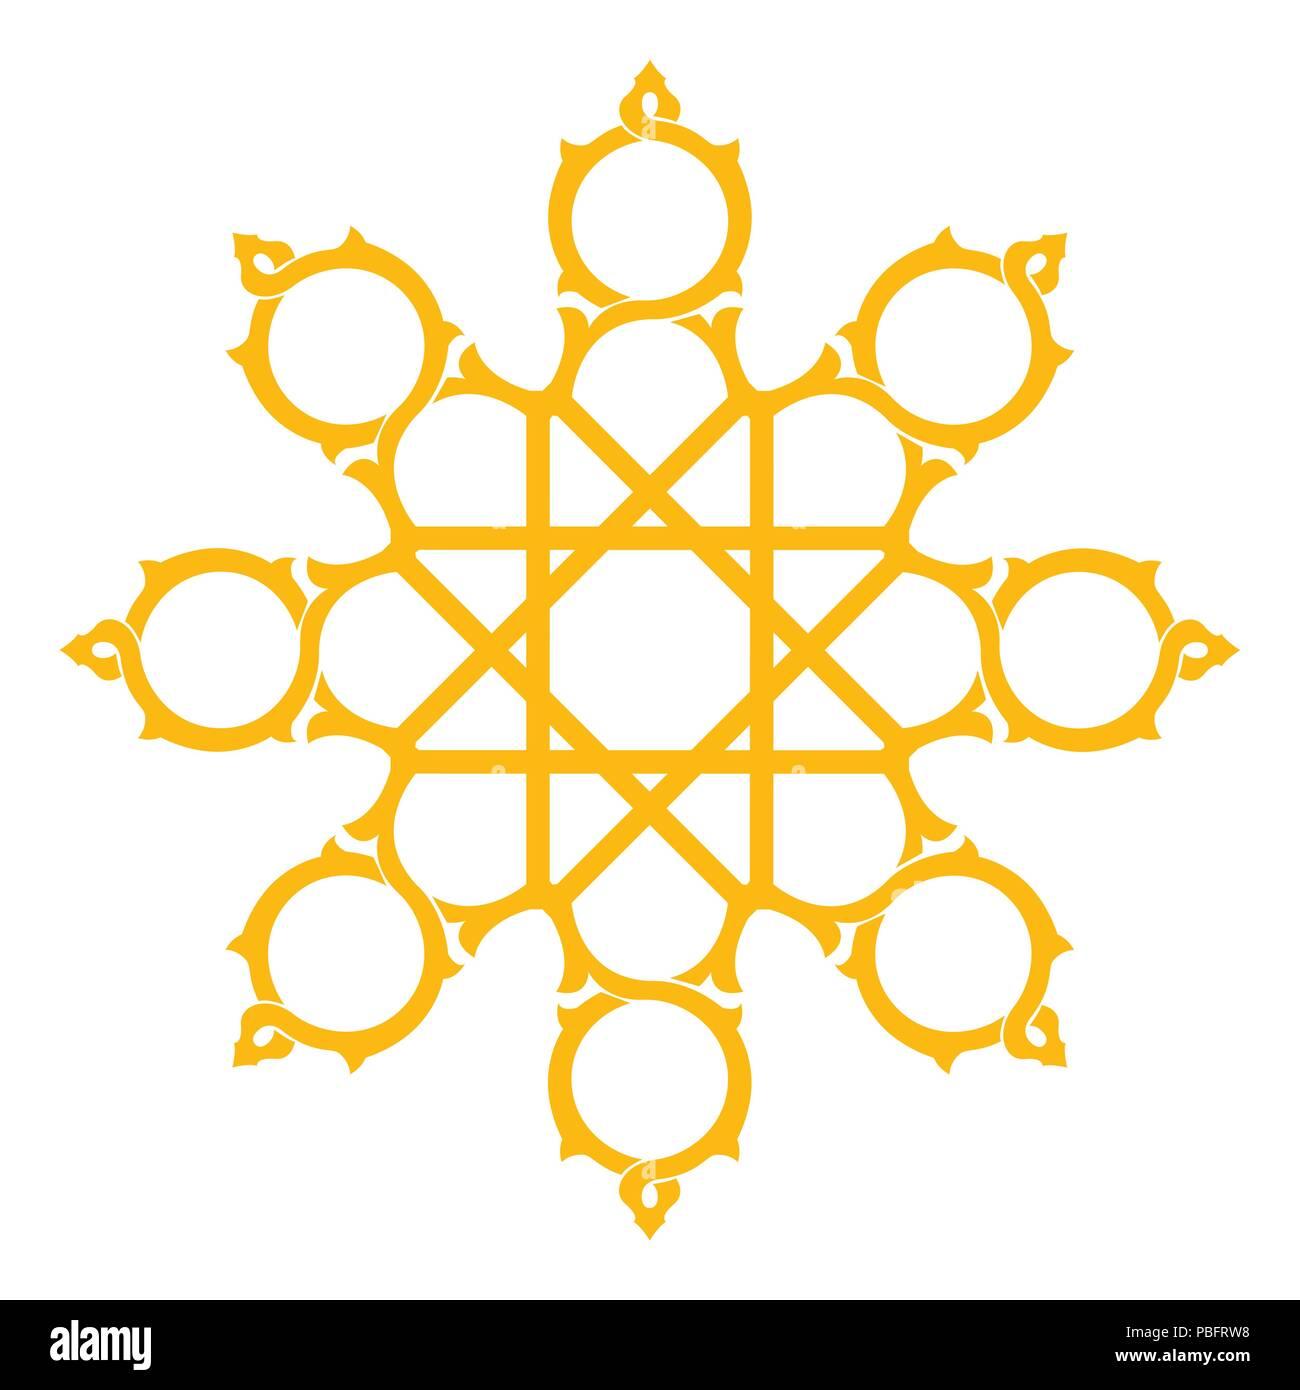 arabesque star shape artistic design element stock vector art rh alamy com Bracket Shape Line Shapes Clip Art